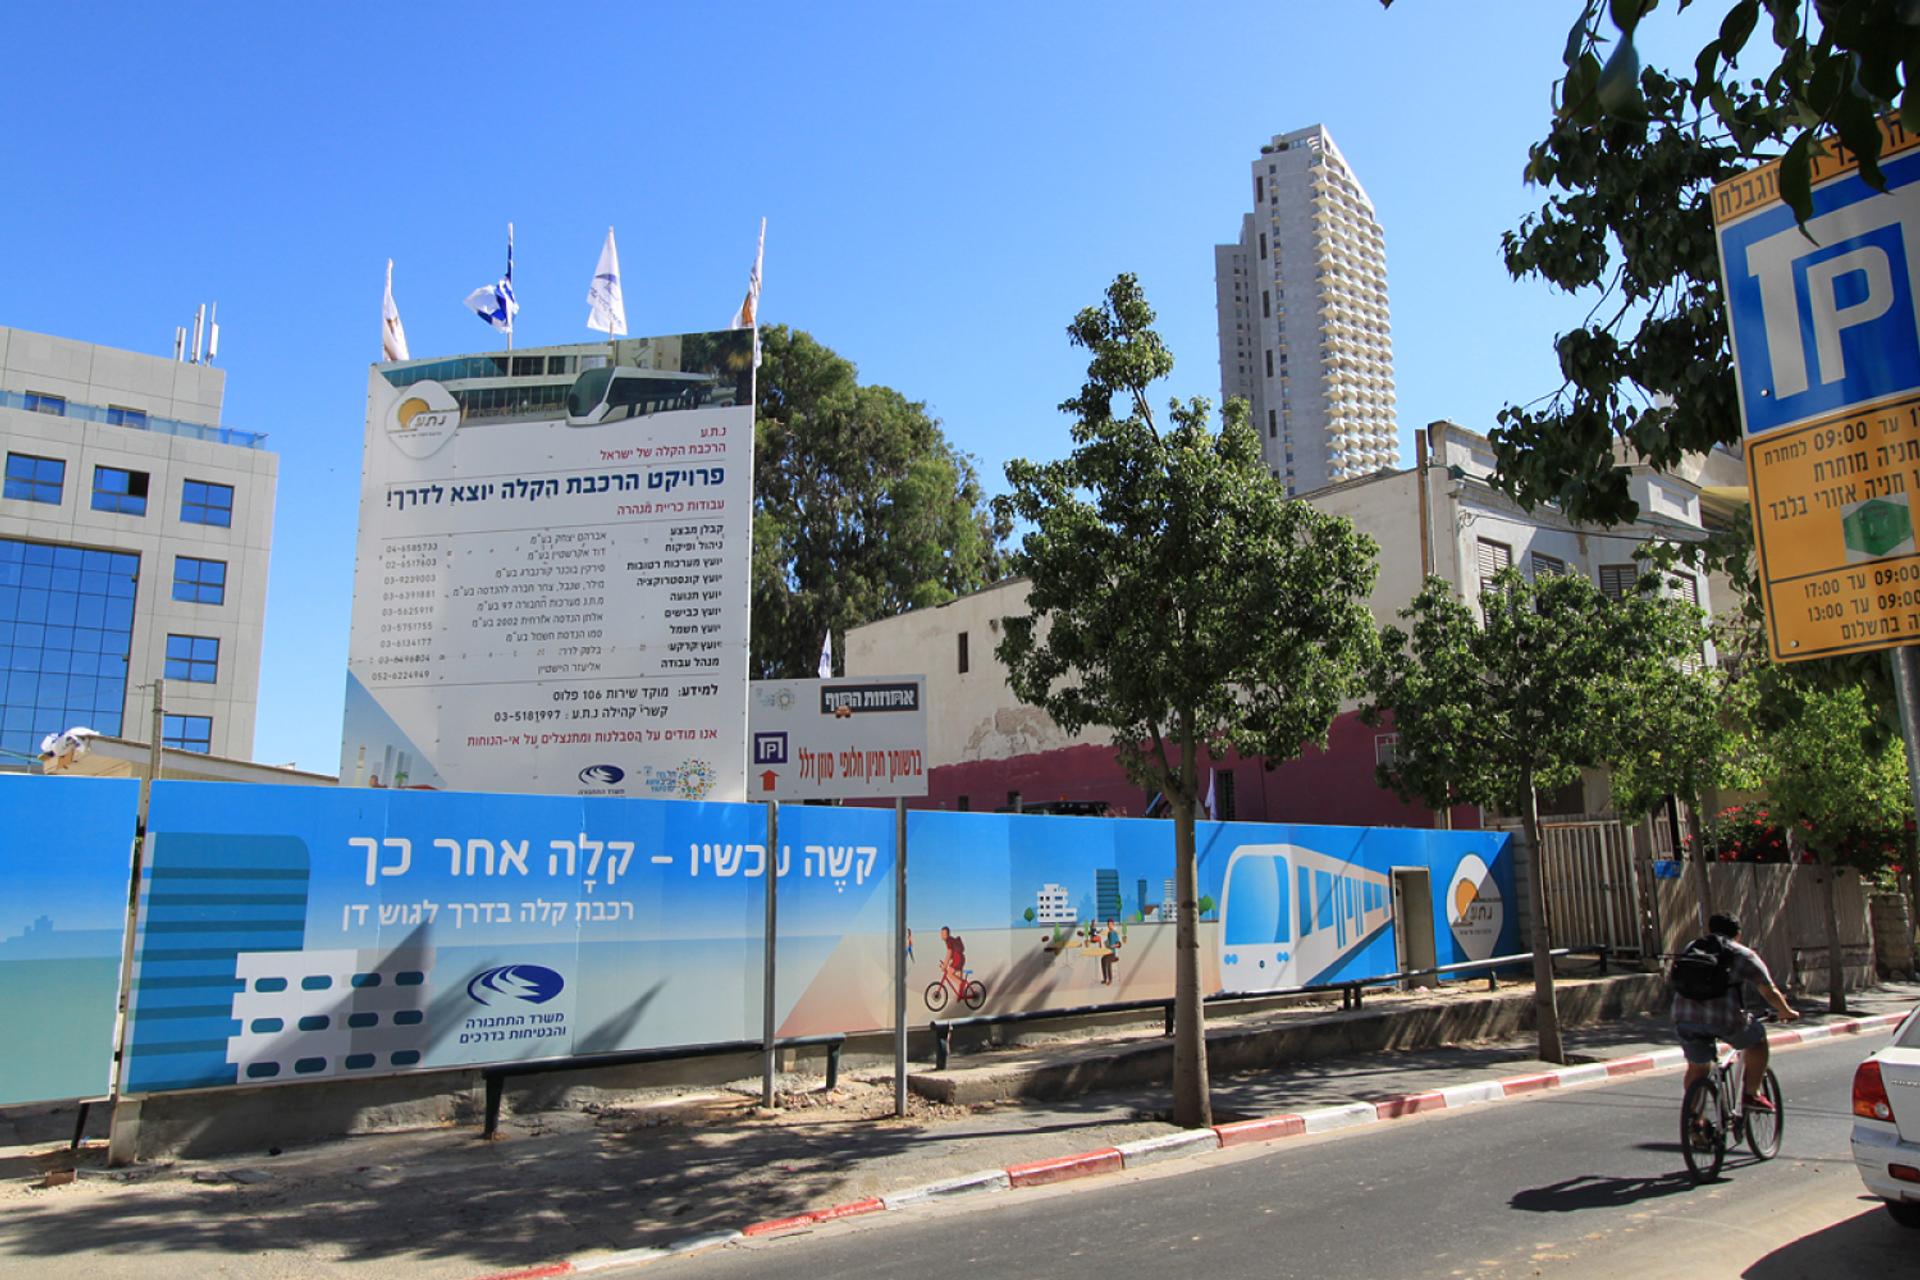 Tel Aviv Light Rail, construction site on Yehuda Halevi Street in 2012 - Sputnik International, 1920, 13.10.2021